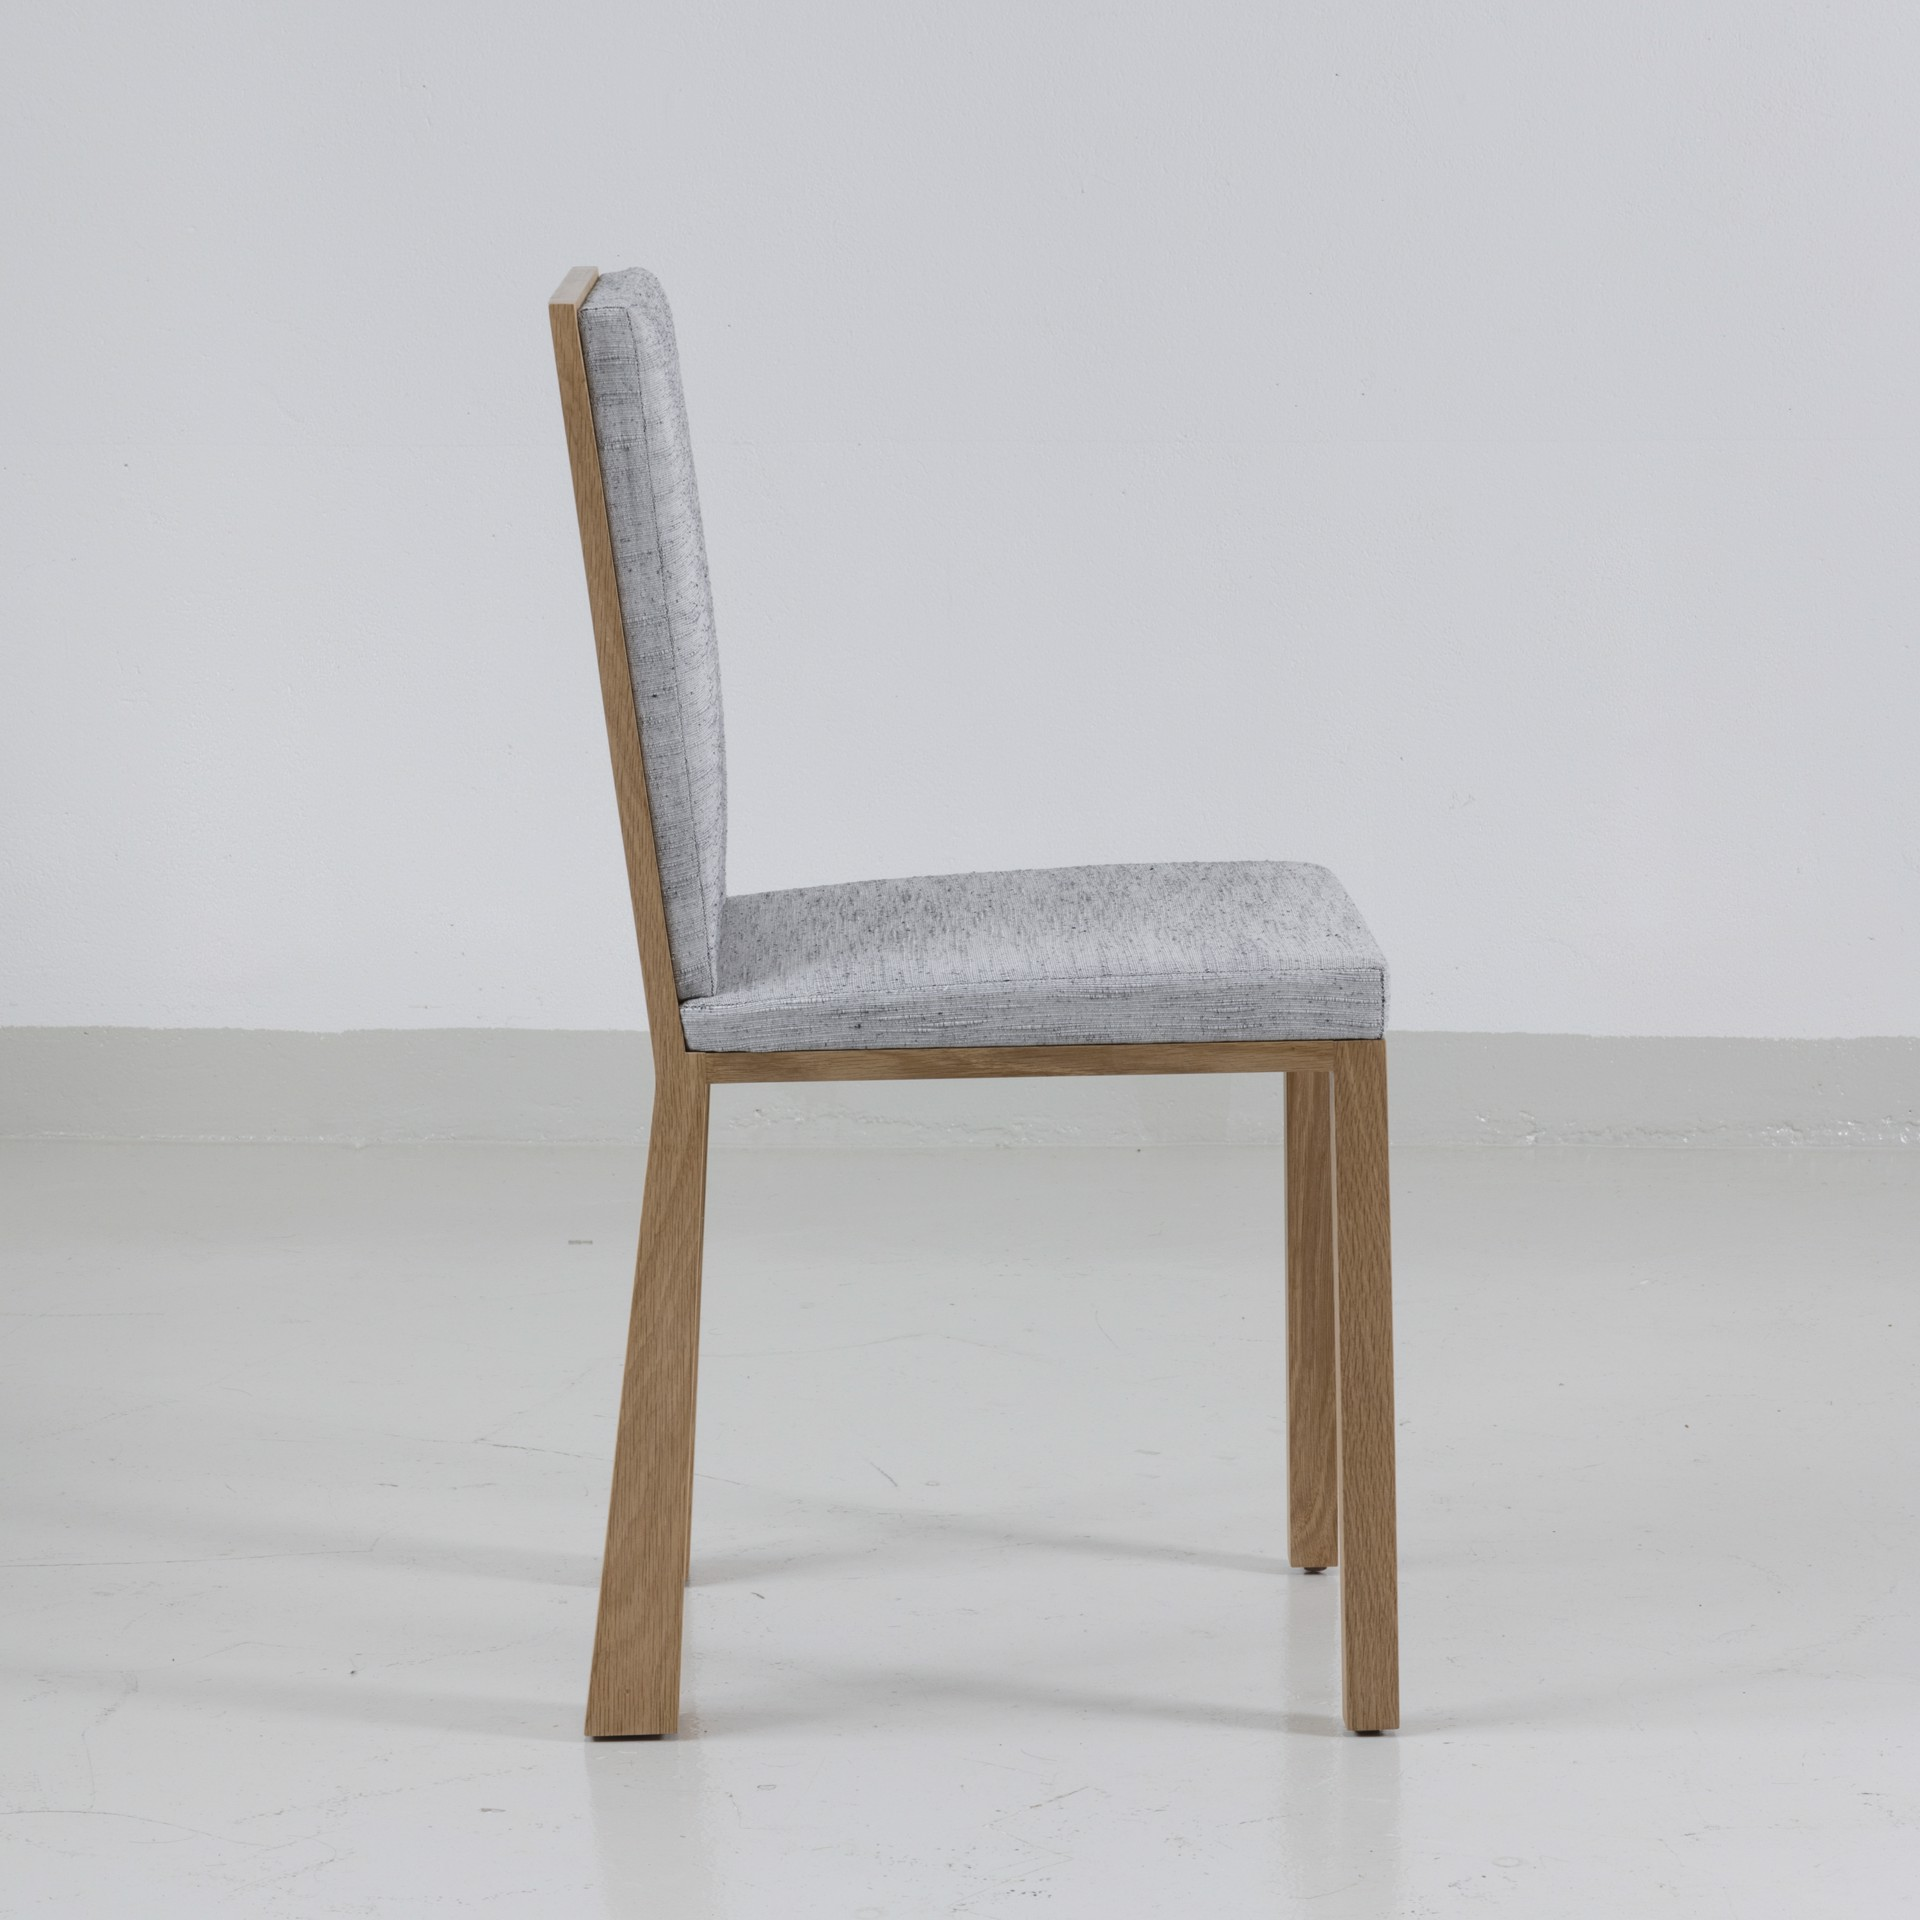 Chair #2 by Tinatin Kilaberidze